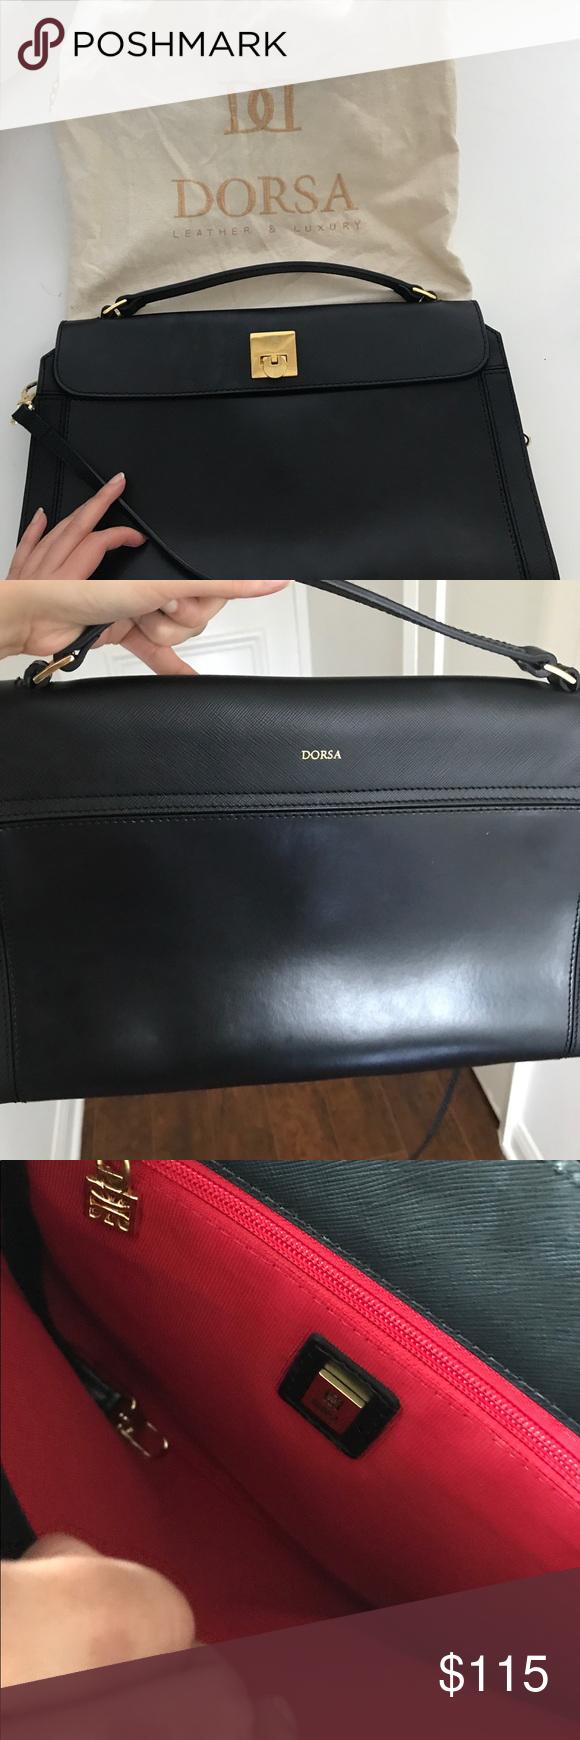 dorsa leather bag